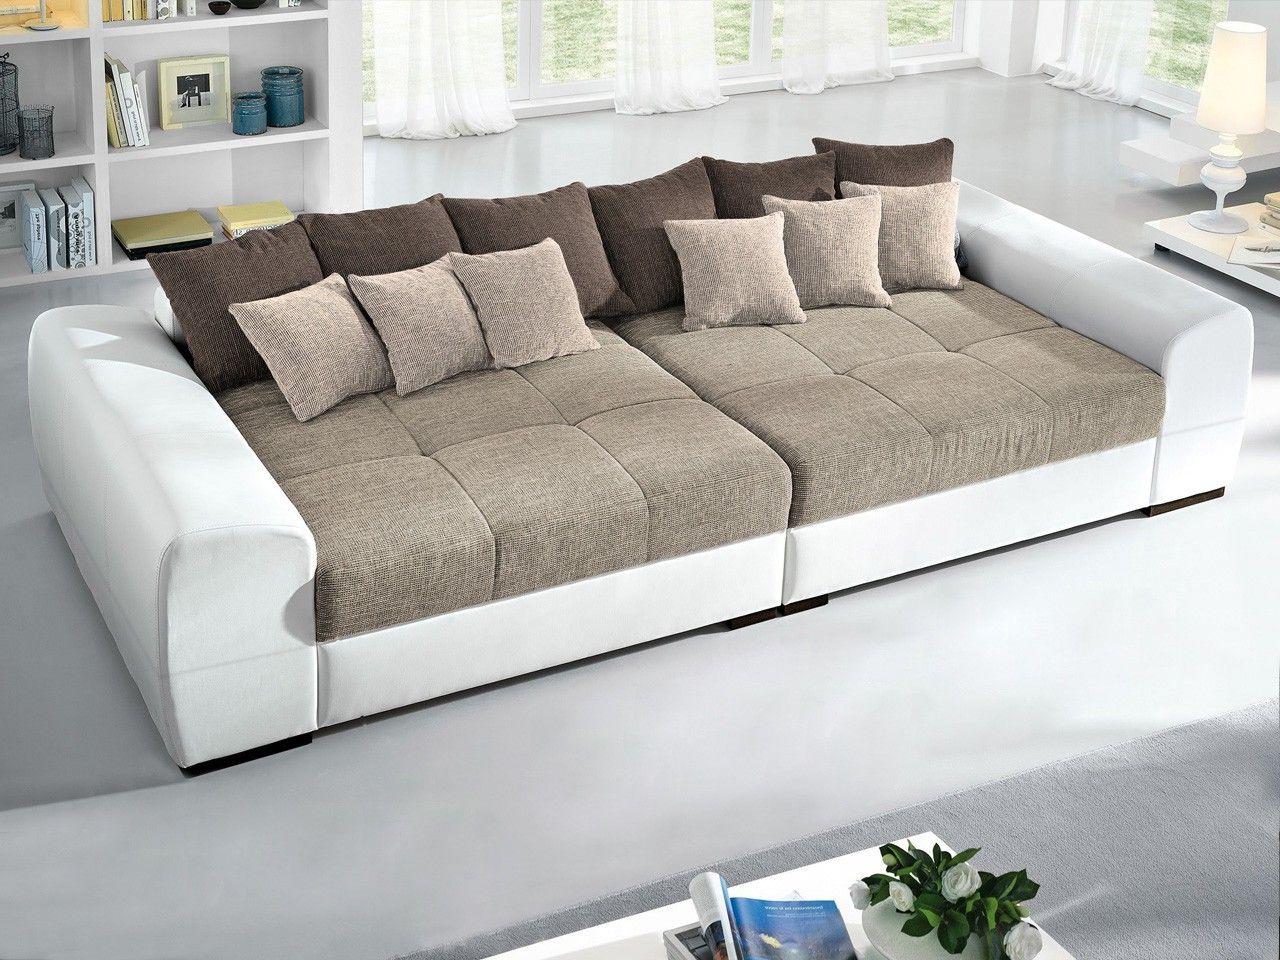 Dicoro sofas 0gdr Dicoro sofà atlas Furniture In 2018 sofa Furniture Room